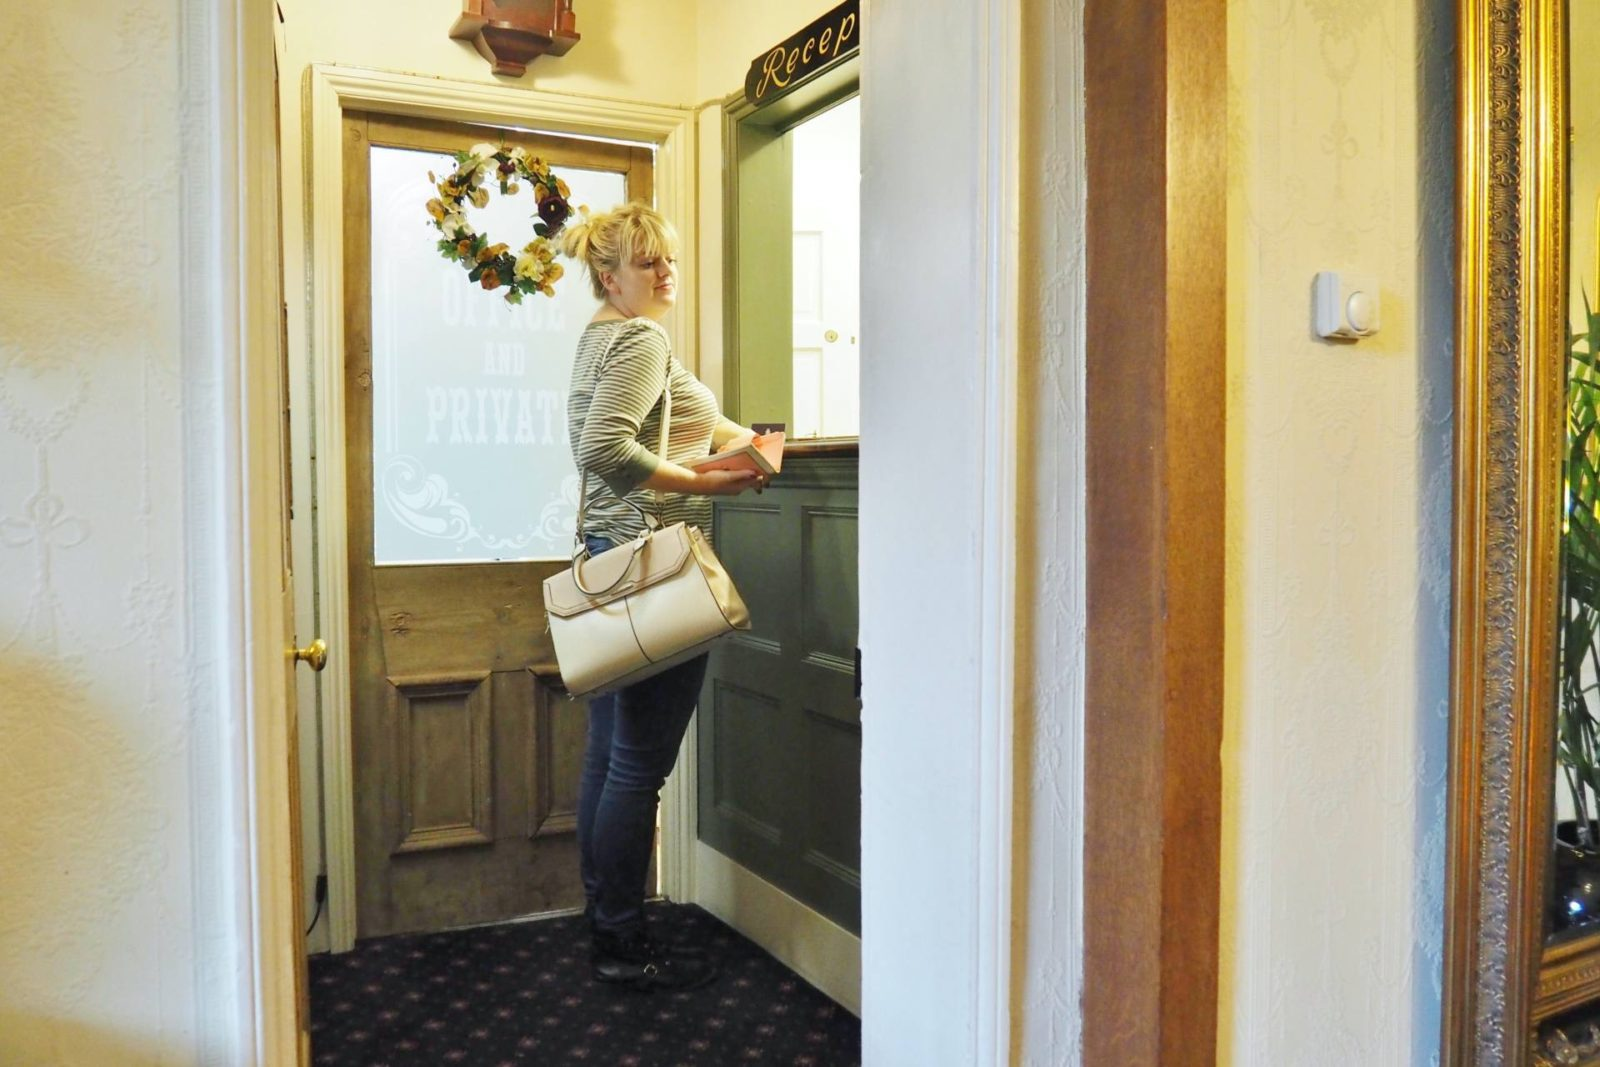 Netherstow-House-Lichfield-Emma-Victoria-Stokes